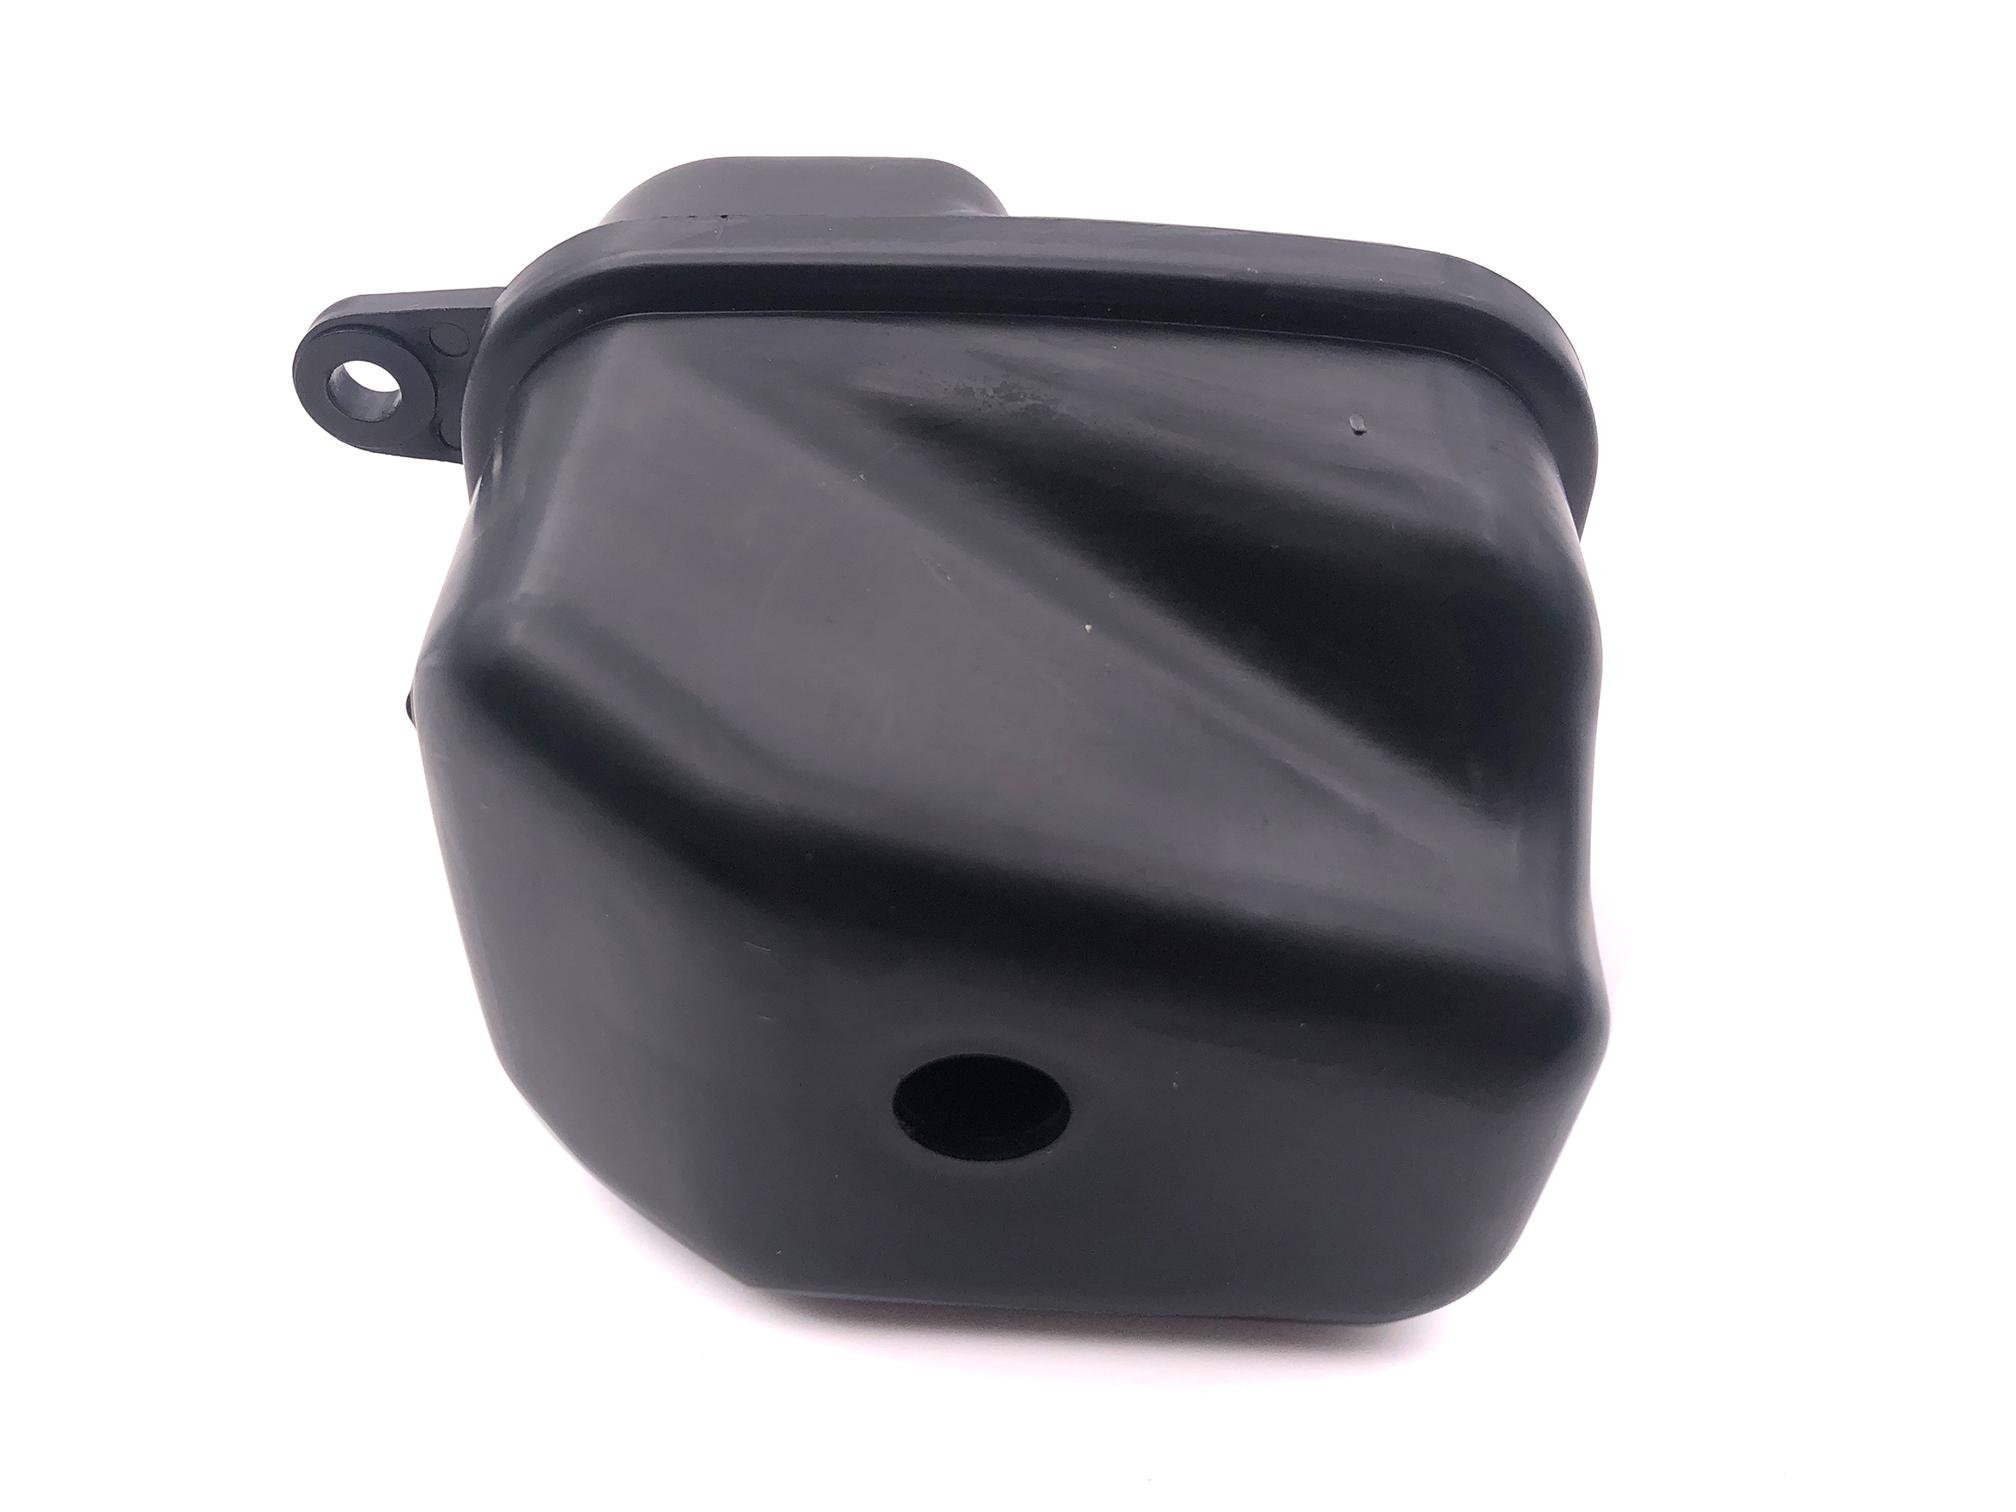 Boite /à air Filtre /à air pour YAMAHA PW50 PIWI 50cc PEE WEE